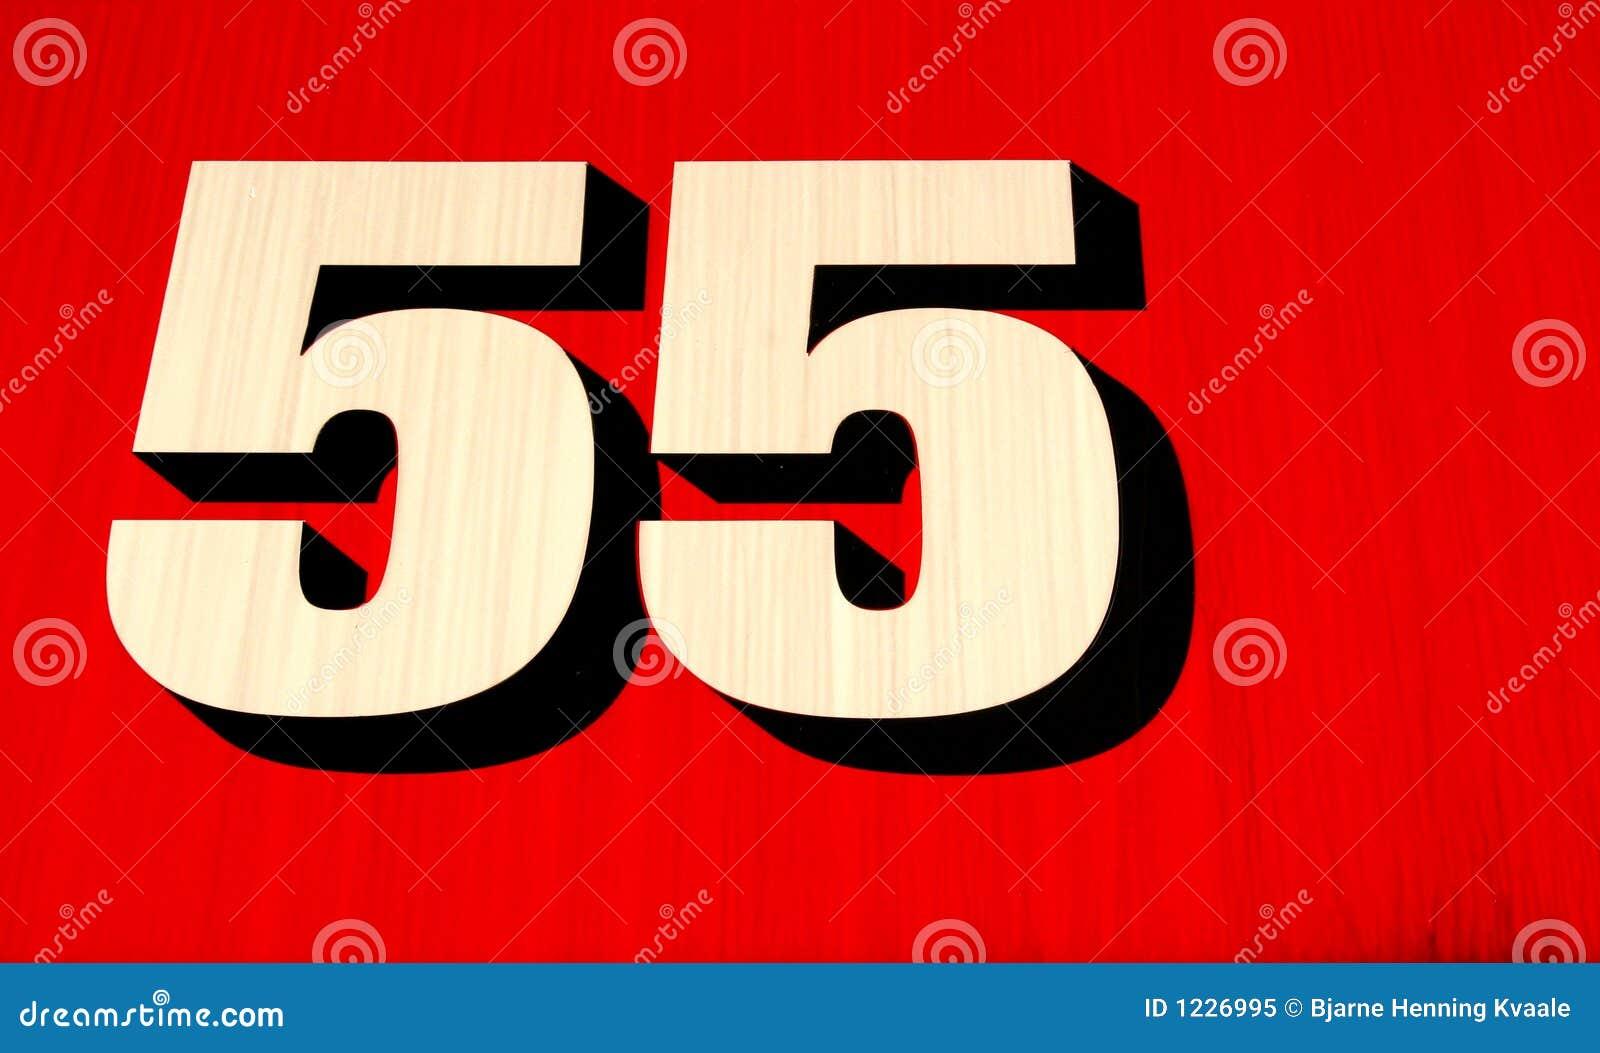 Watch 55 video